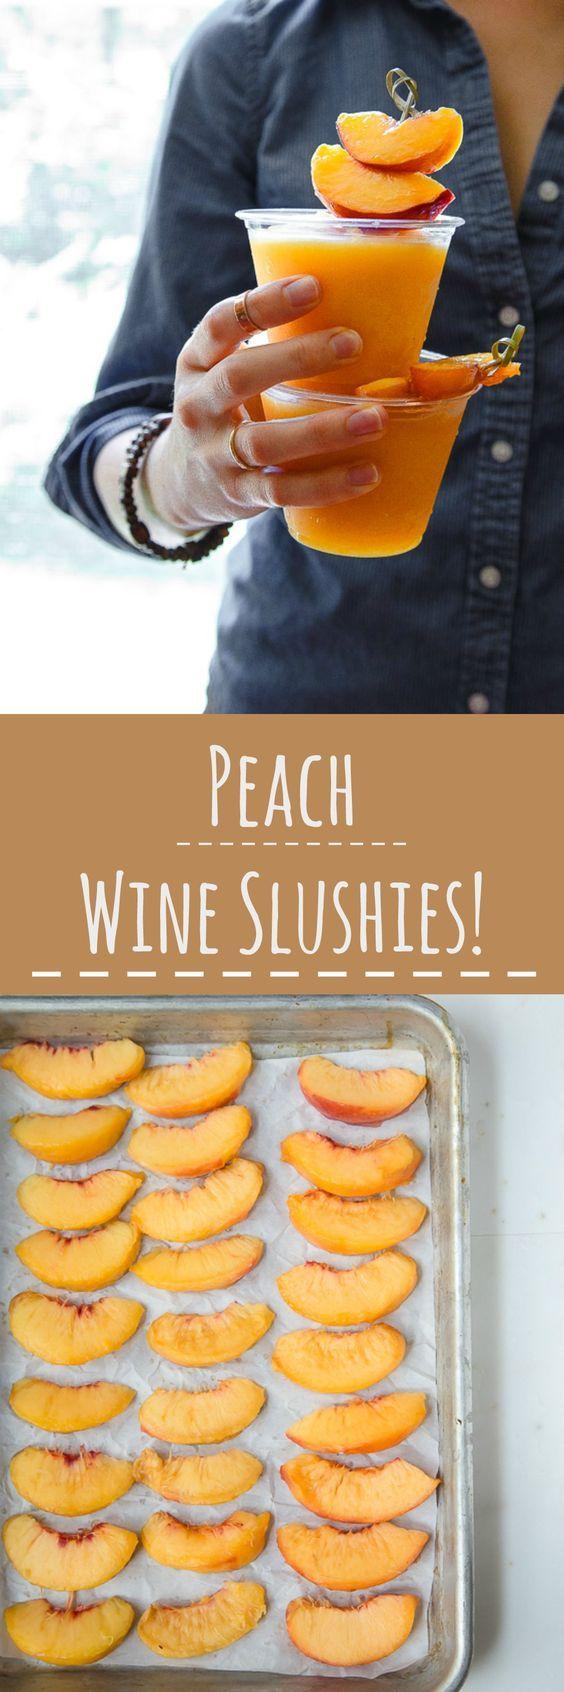 Publix white apron recipes - Peach Wine Slushies